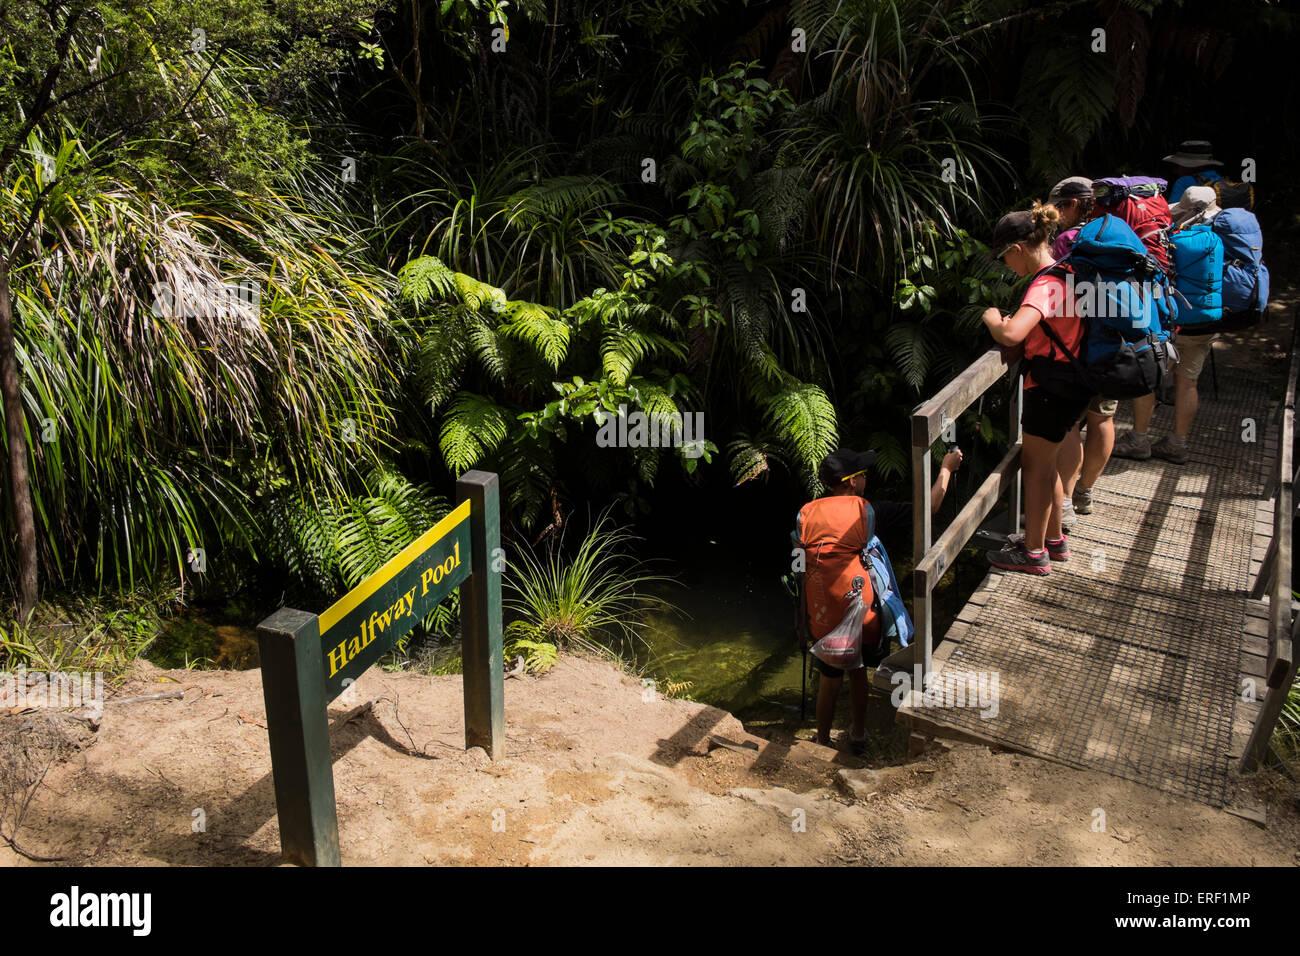 Walkers pause at Halfway Pool along the Abel Tasman coastal track, New Zealand. - Stock Image